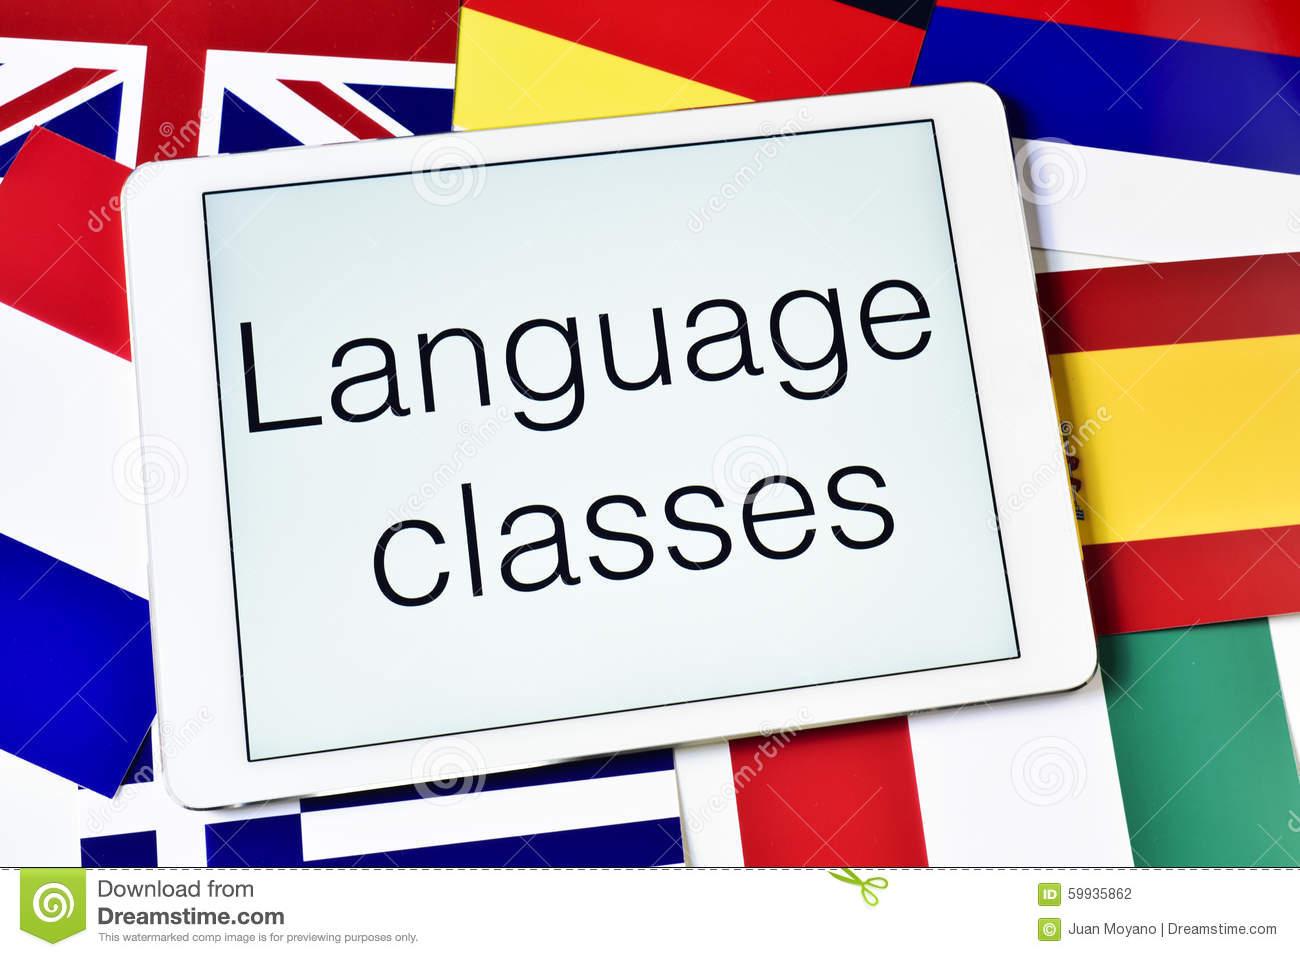 Mongolian Language Classes in Greater Noida | Mongolian Language Course in Greater Noida